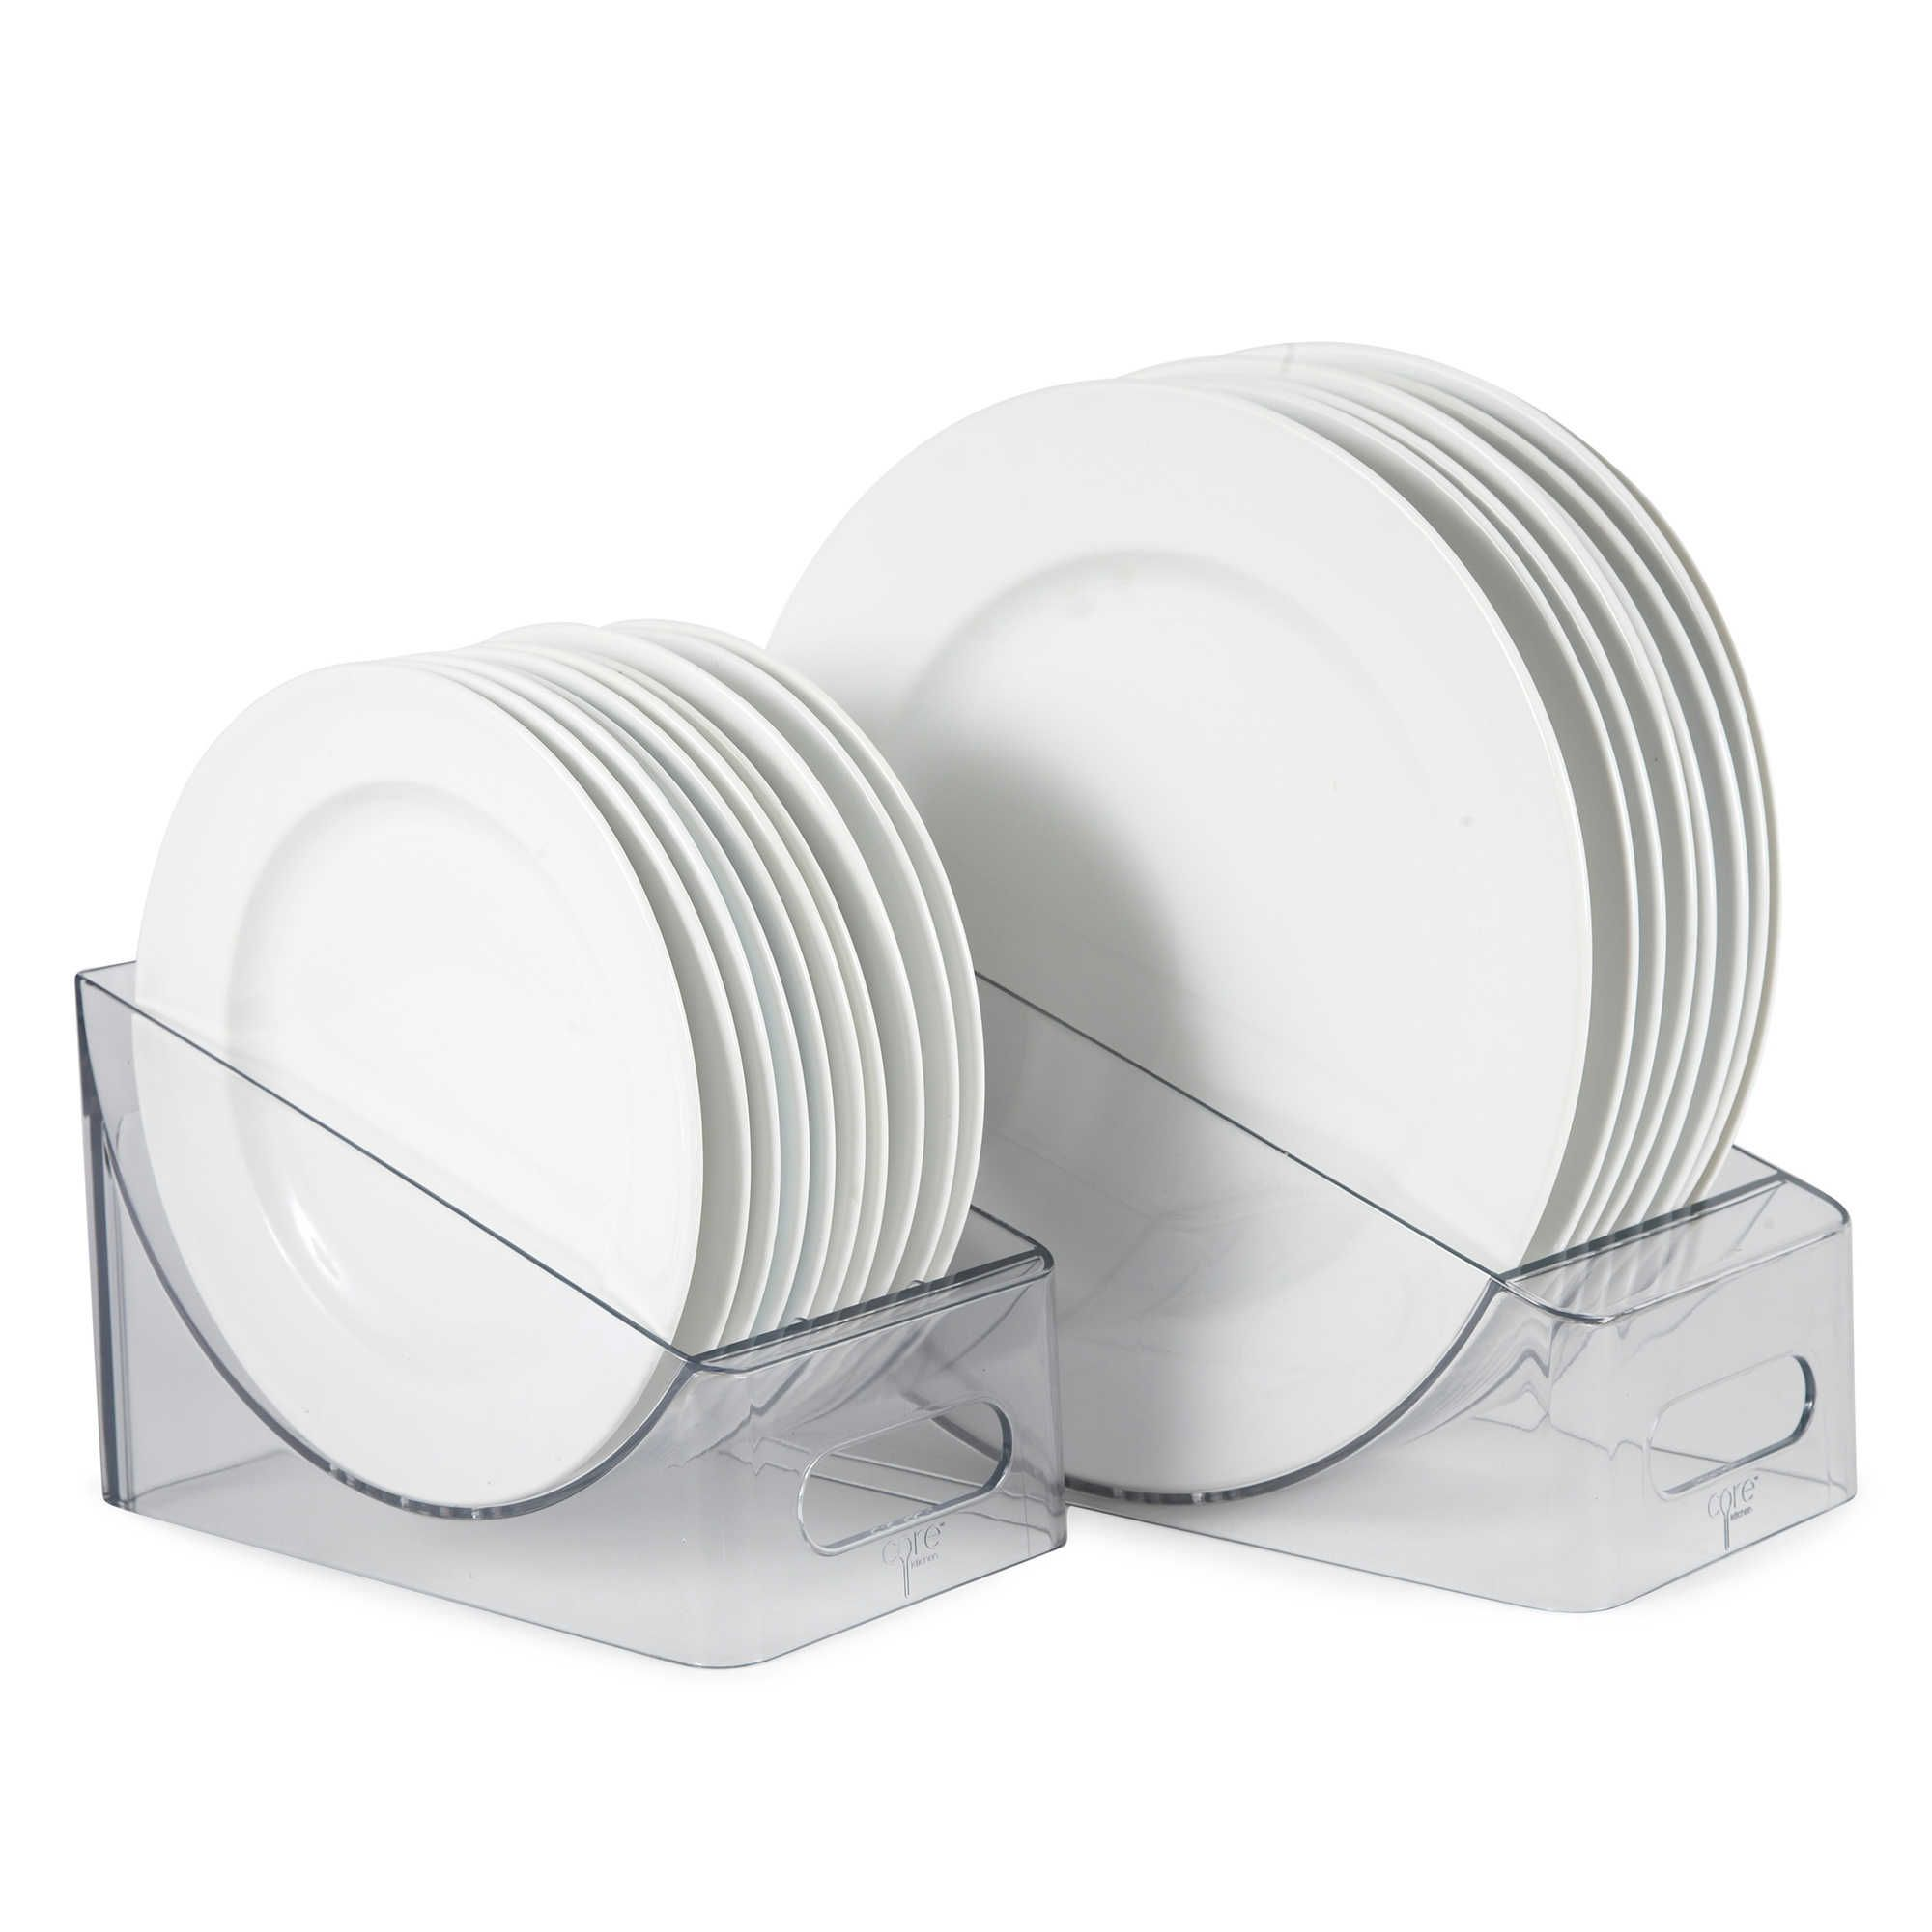 Core Kitchen Large Plate Holder | Organization | Pinterest | Large ...